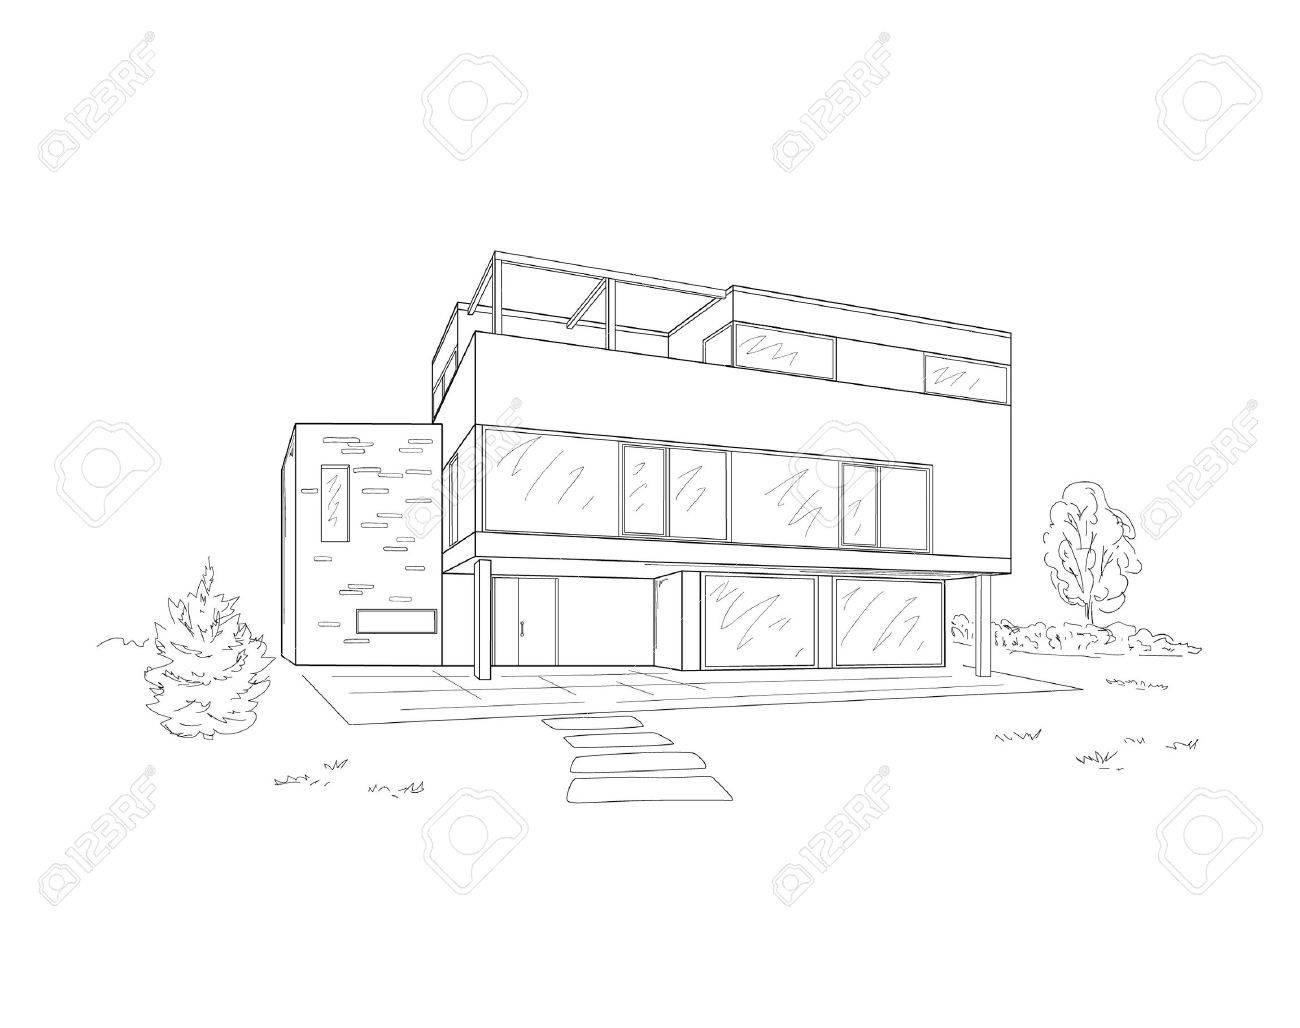 Building Drawing oyalty Free liparts, Vectors, nd Stock ... - ^